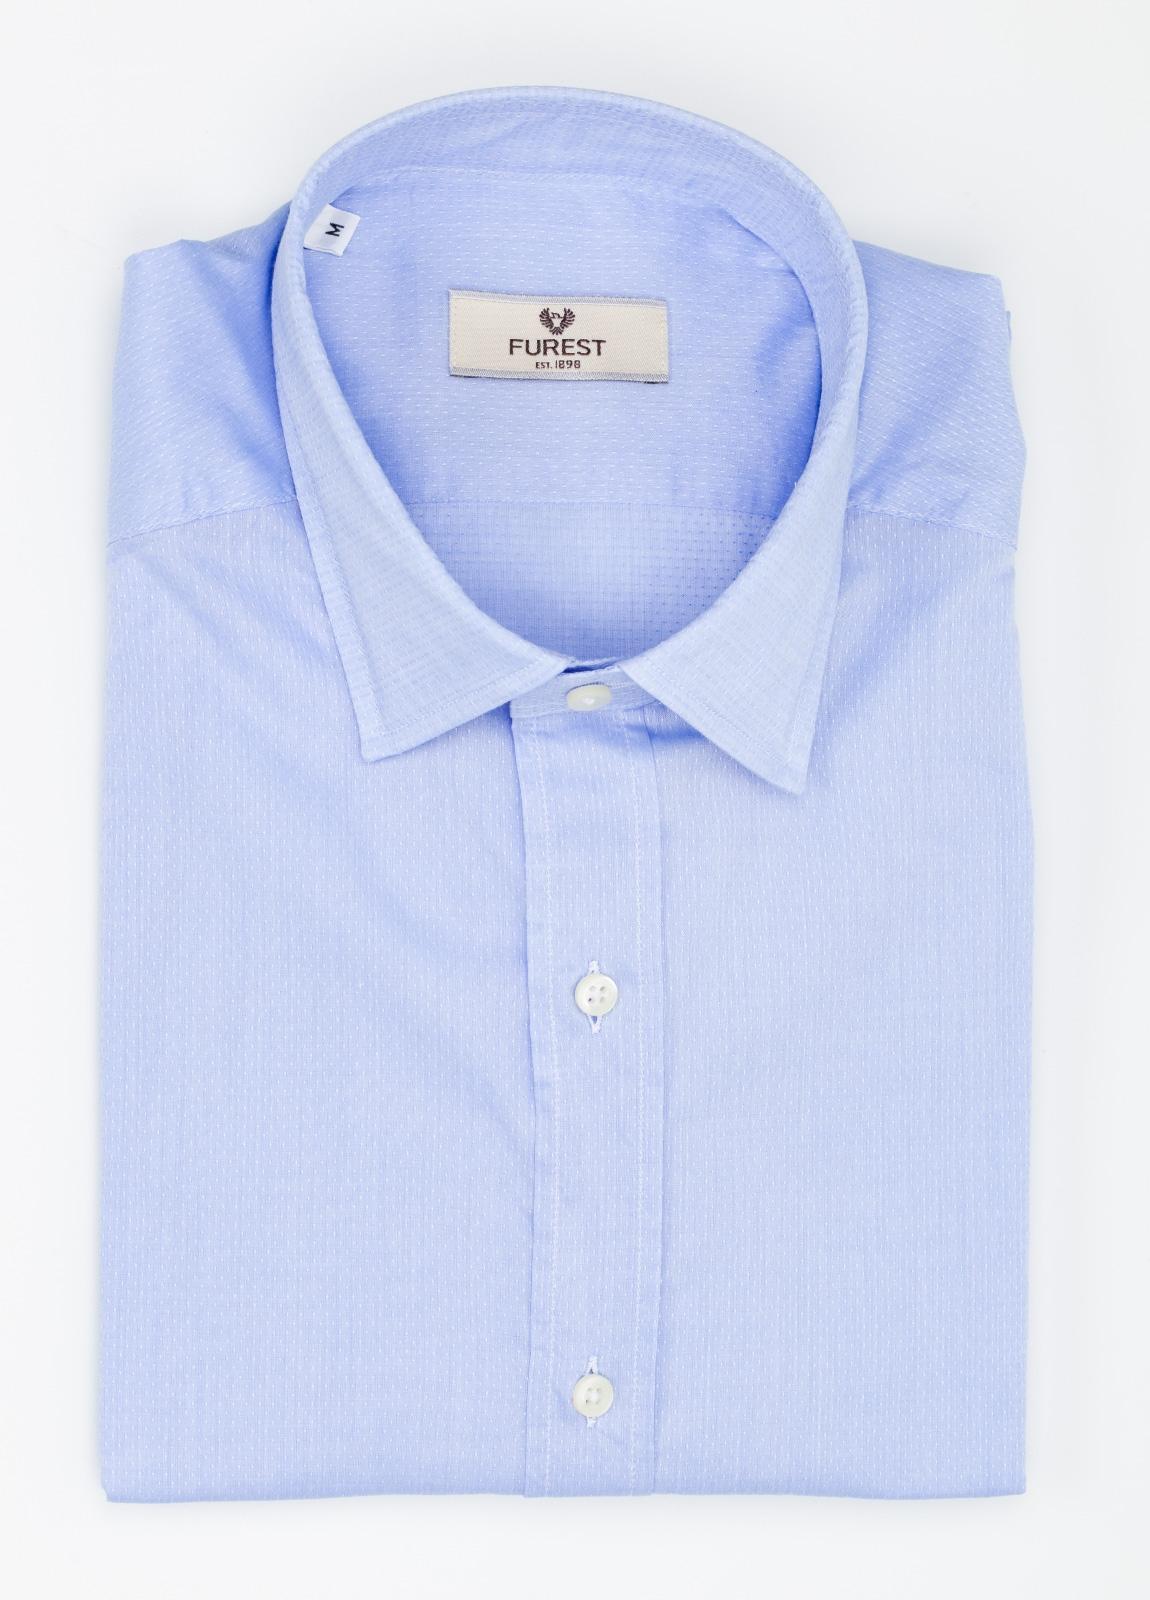 Camisa Leisure Wear SLIM FIT modelo PORTO microtextura color azul. 100% Algodón.